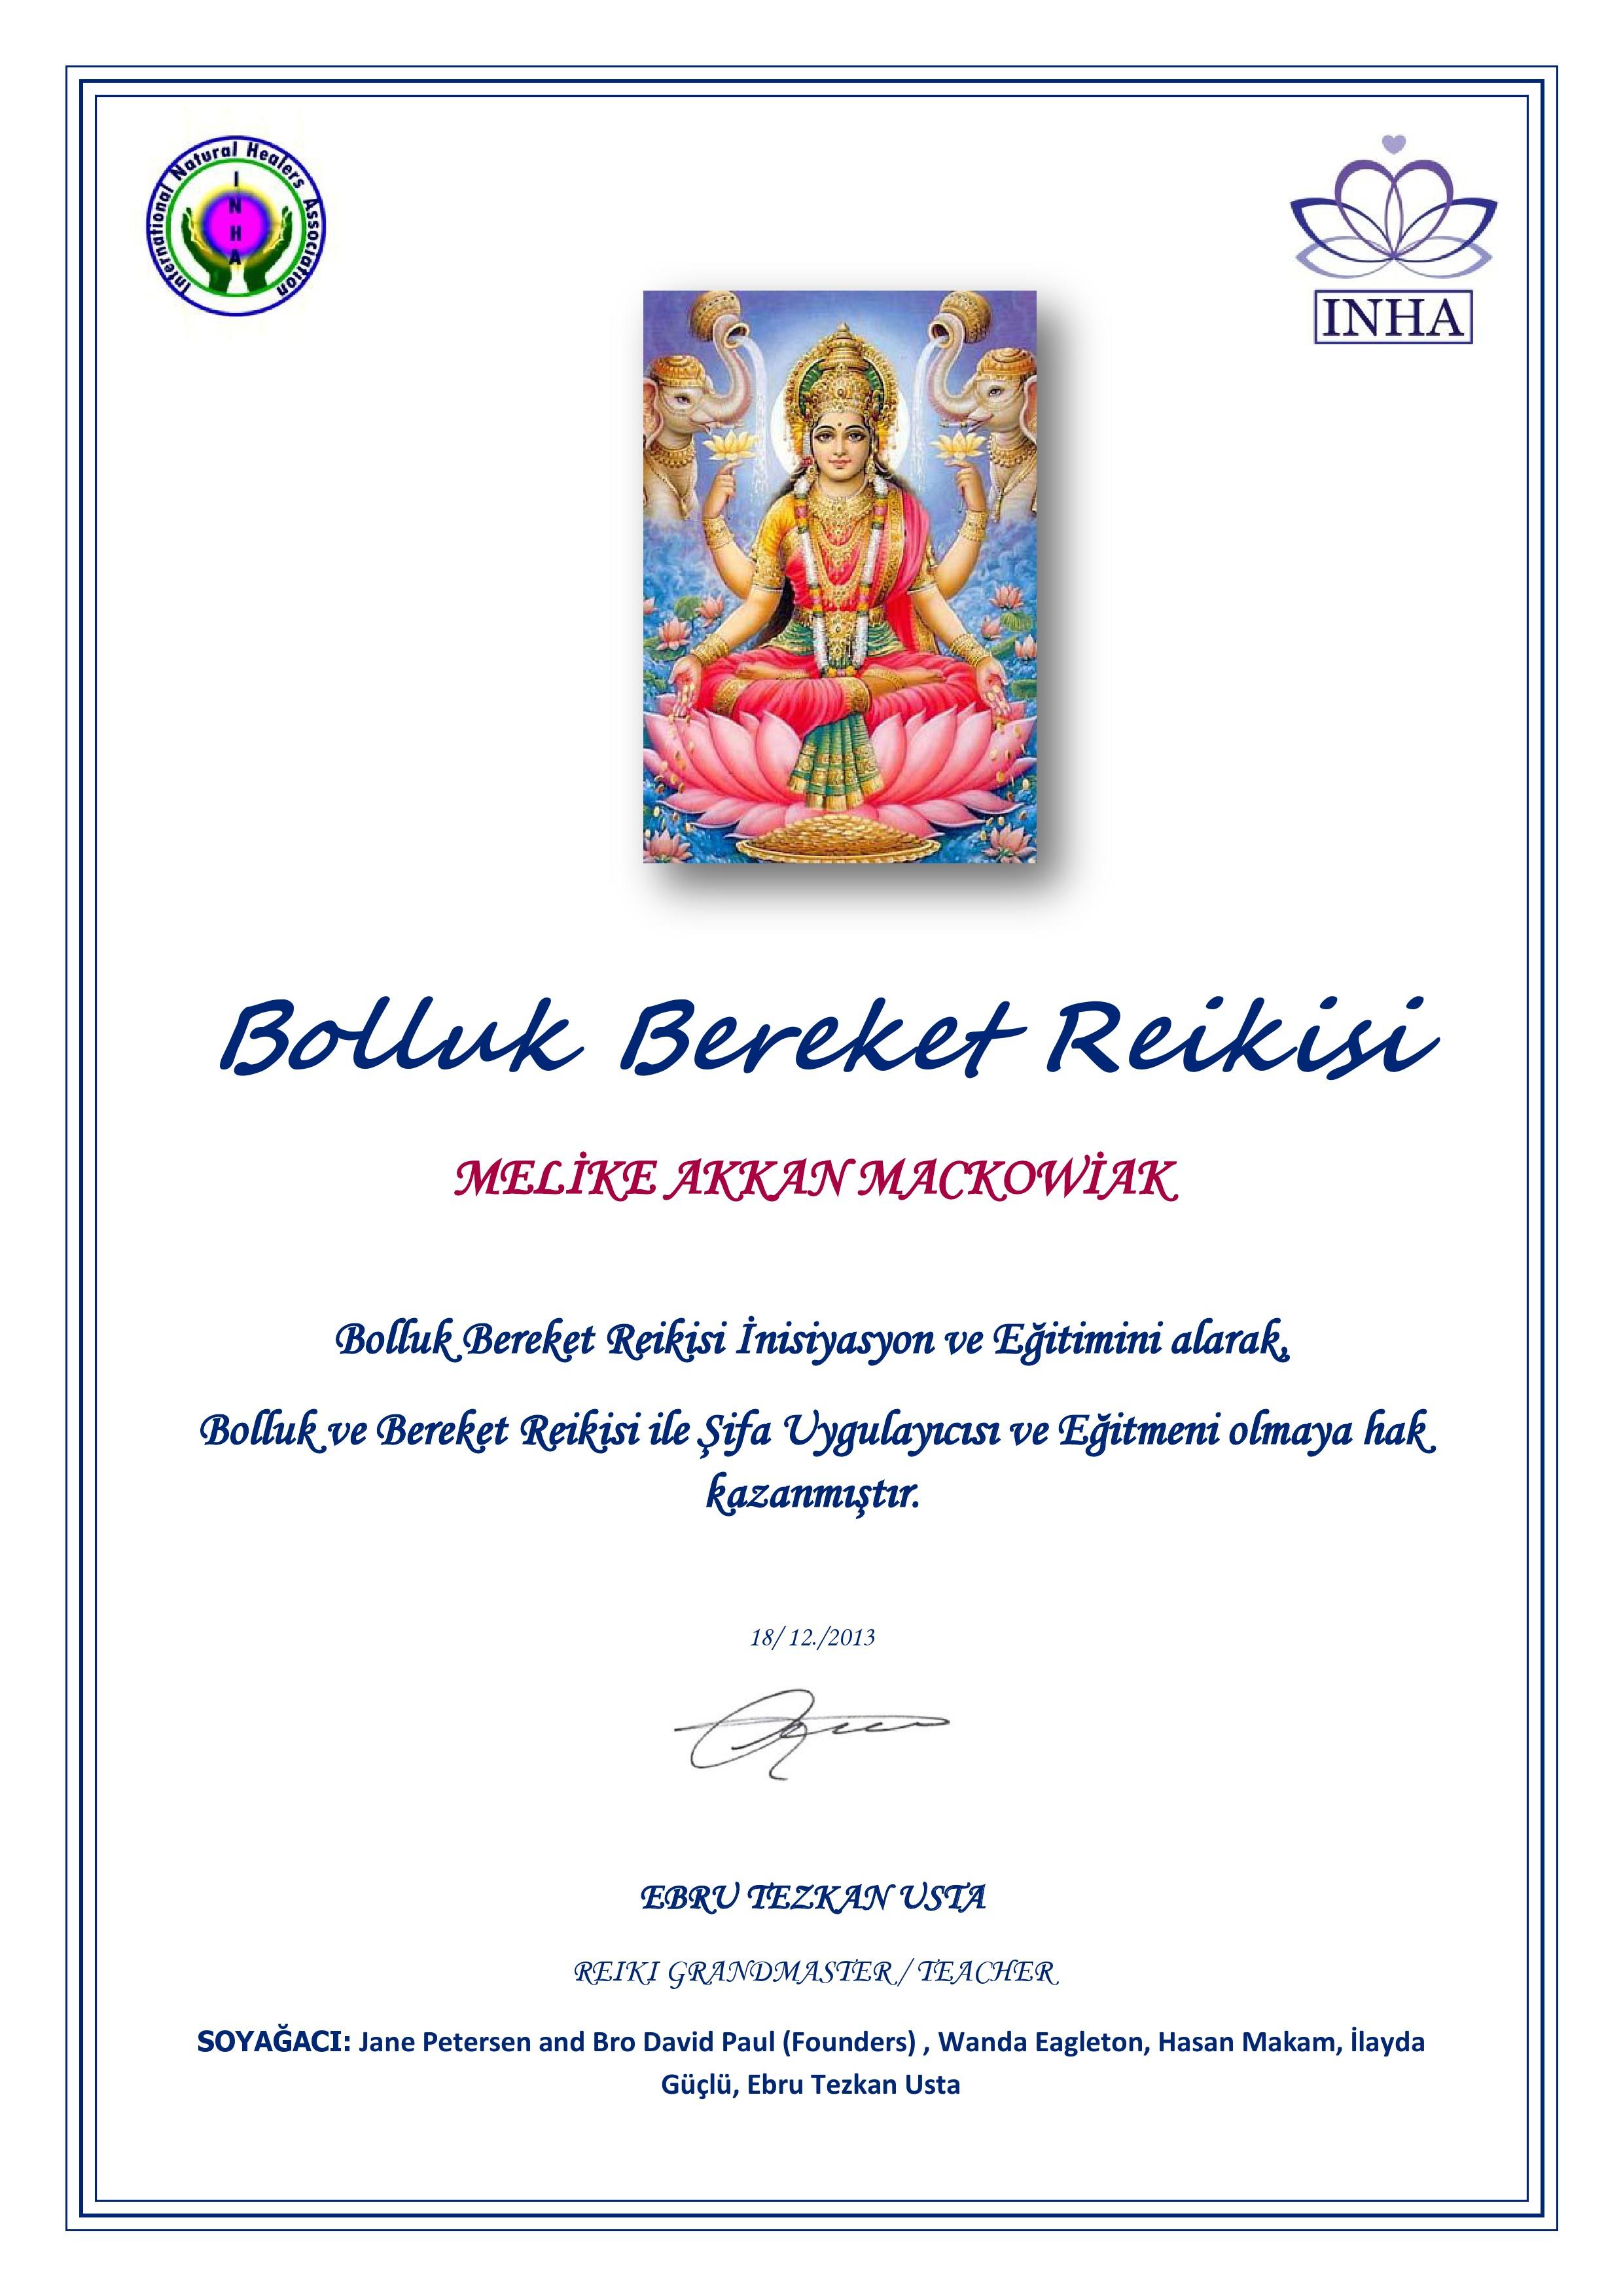 bolluk bereket sertifika -1